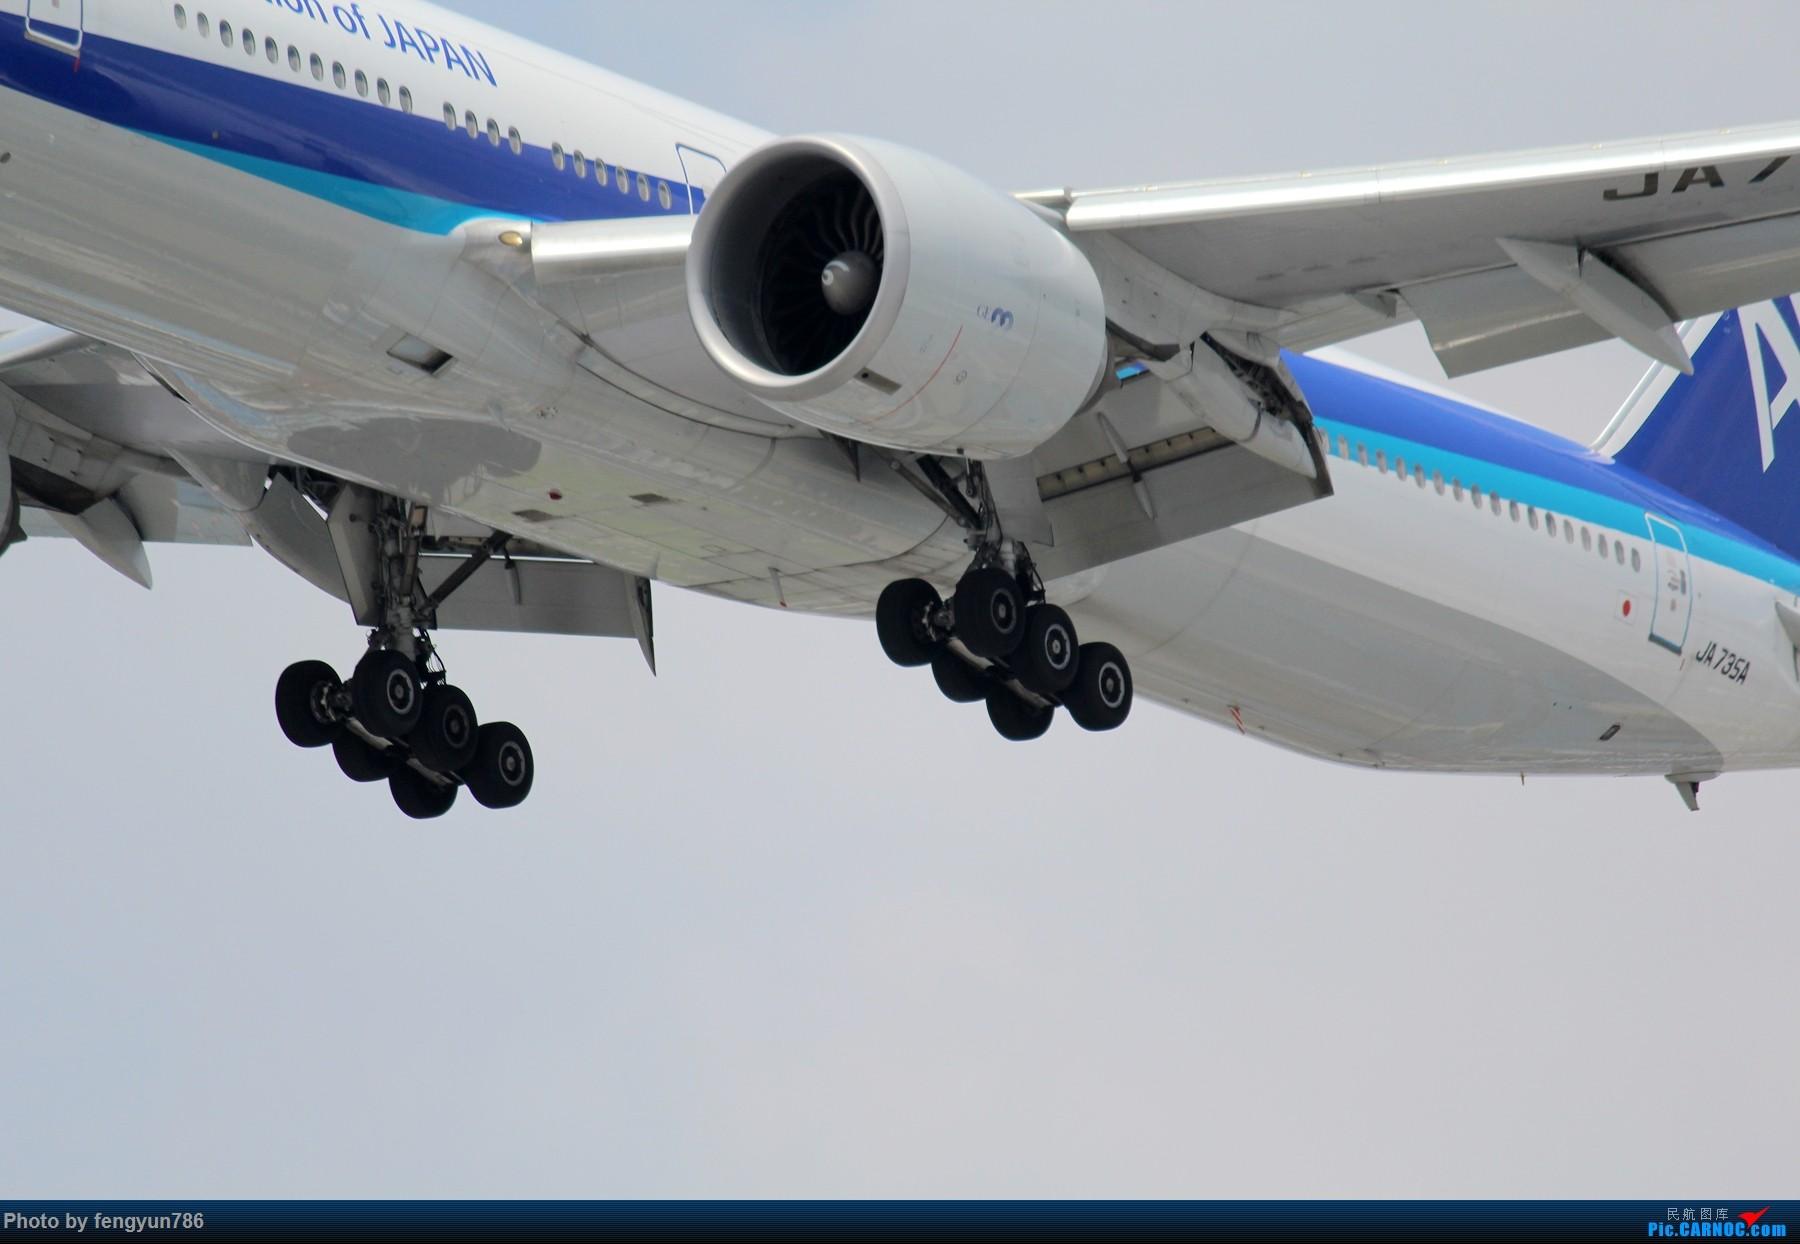 Re:[原创]7.19的SHA,天晴温高,发几个跟前一天不一样的。 BOEING 737-300 JA735A 中国上海虹桥国际机场